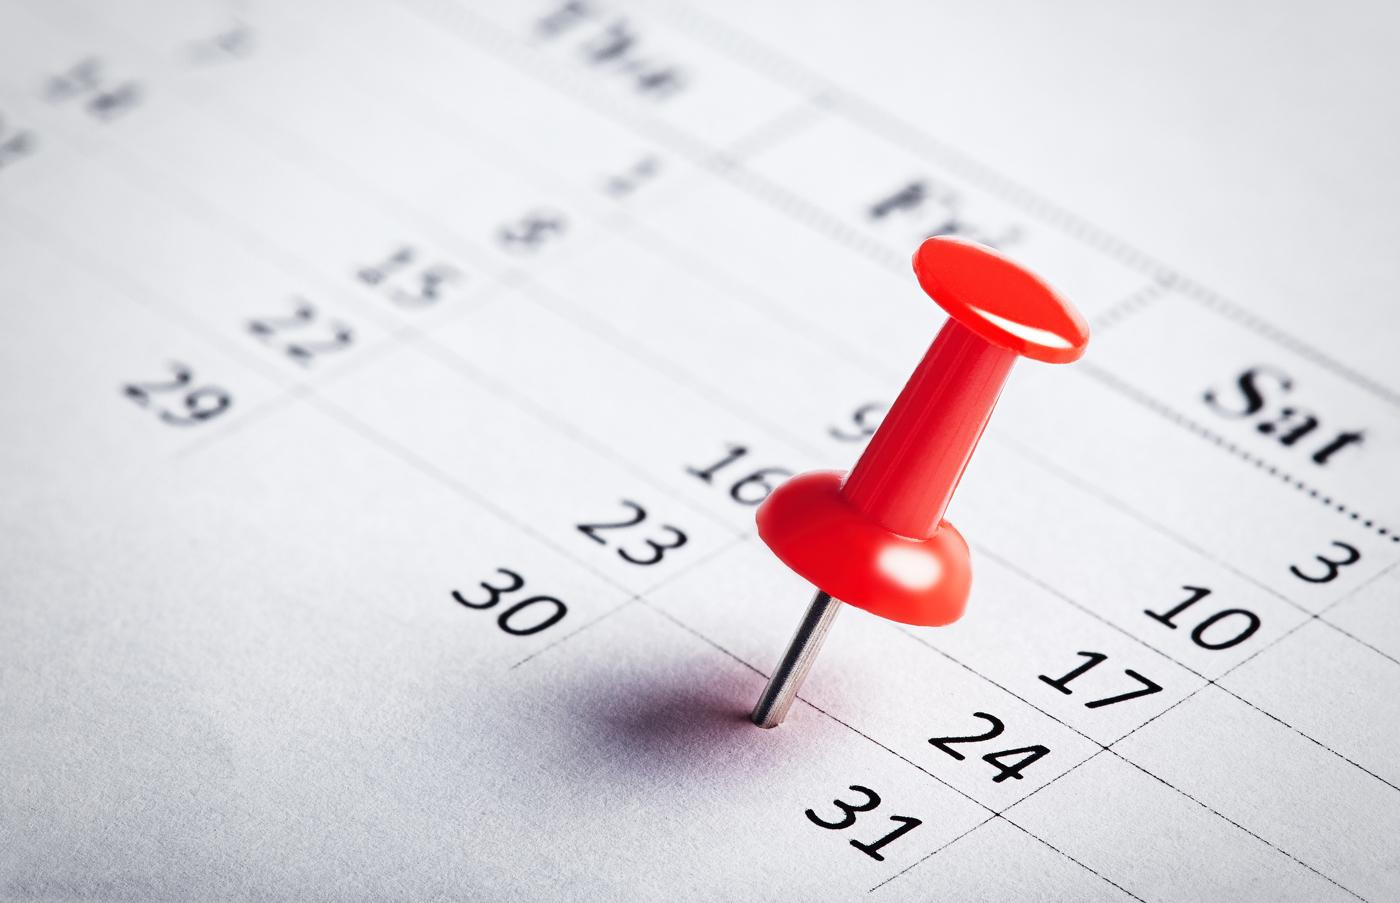 Pushpin on important date on calendar